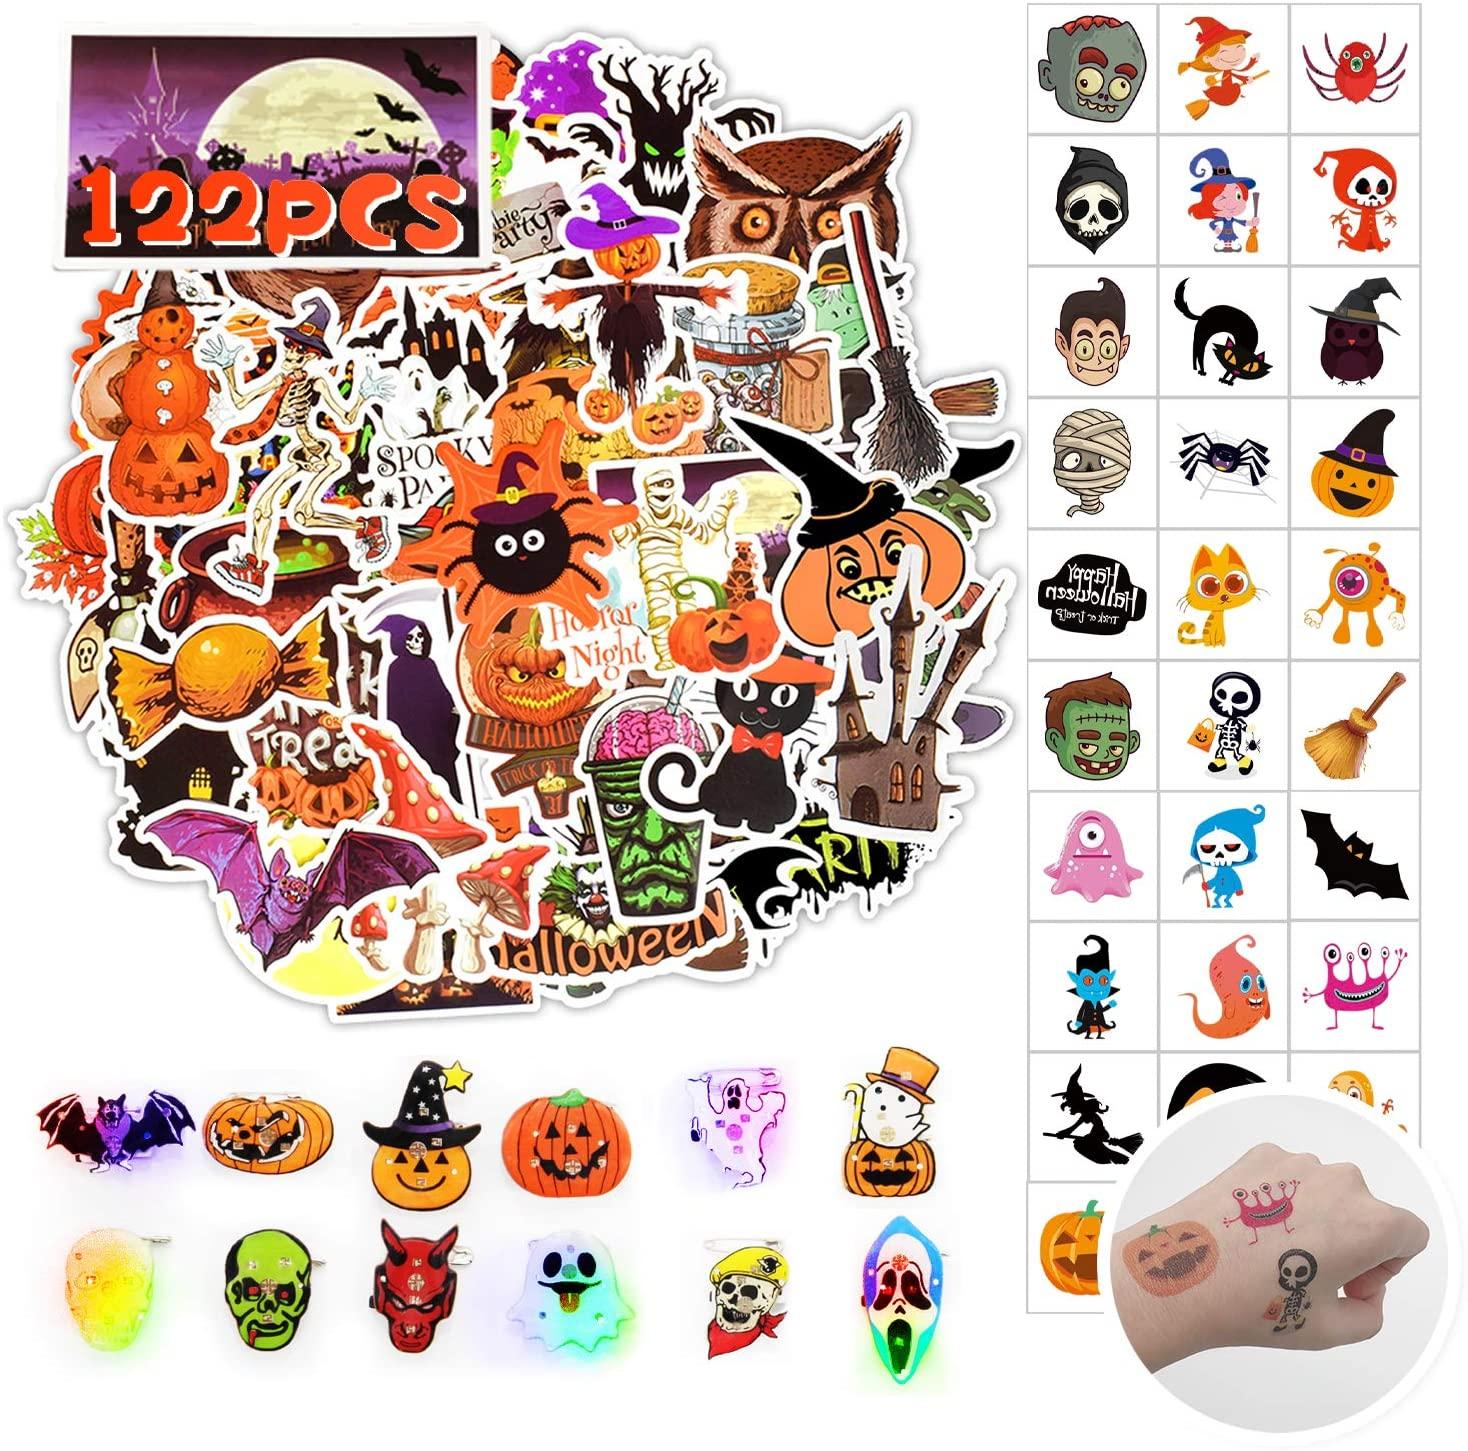 Halloween Stickers(50 Pcs)&Halloween Temporary Tattoos(60 Pcs)&Halloween Led Brooches(12 Pcs) Happy Halloween Decorations,Party Favors, Halloween Class Exchange